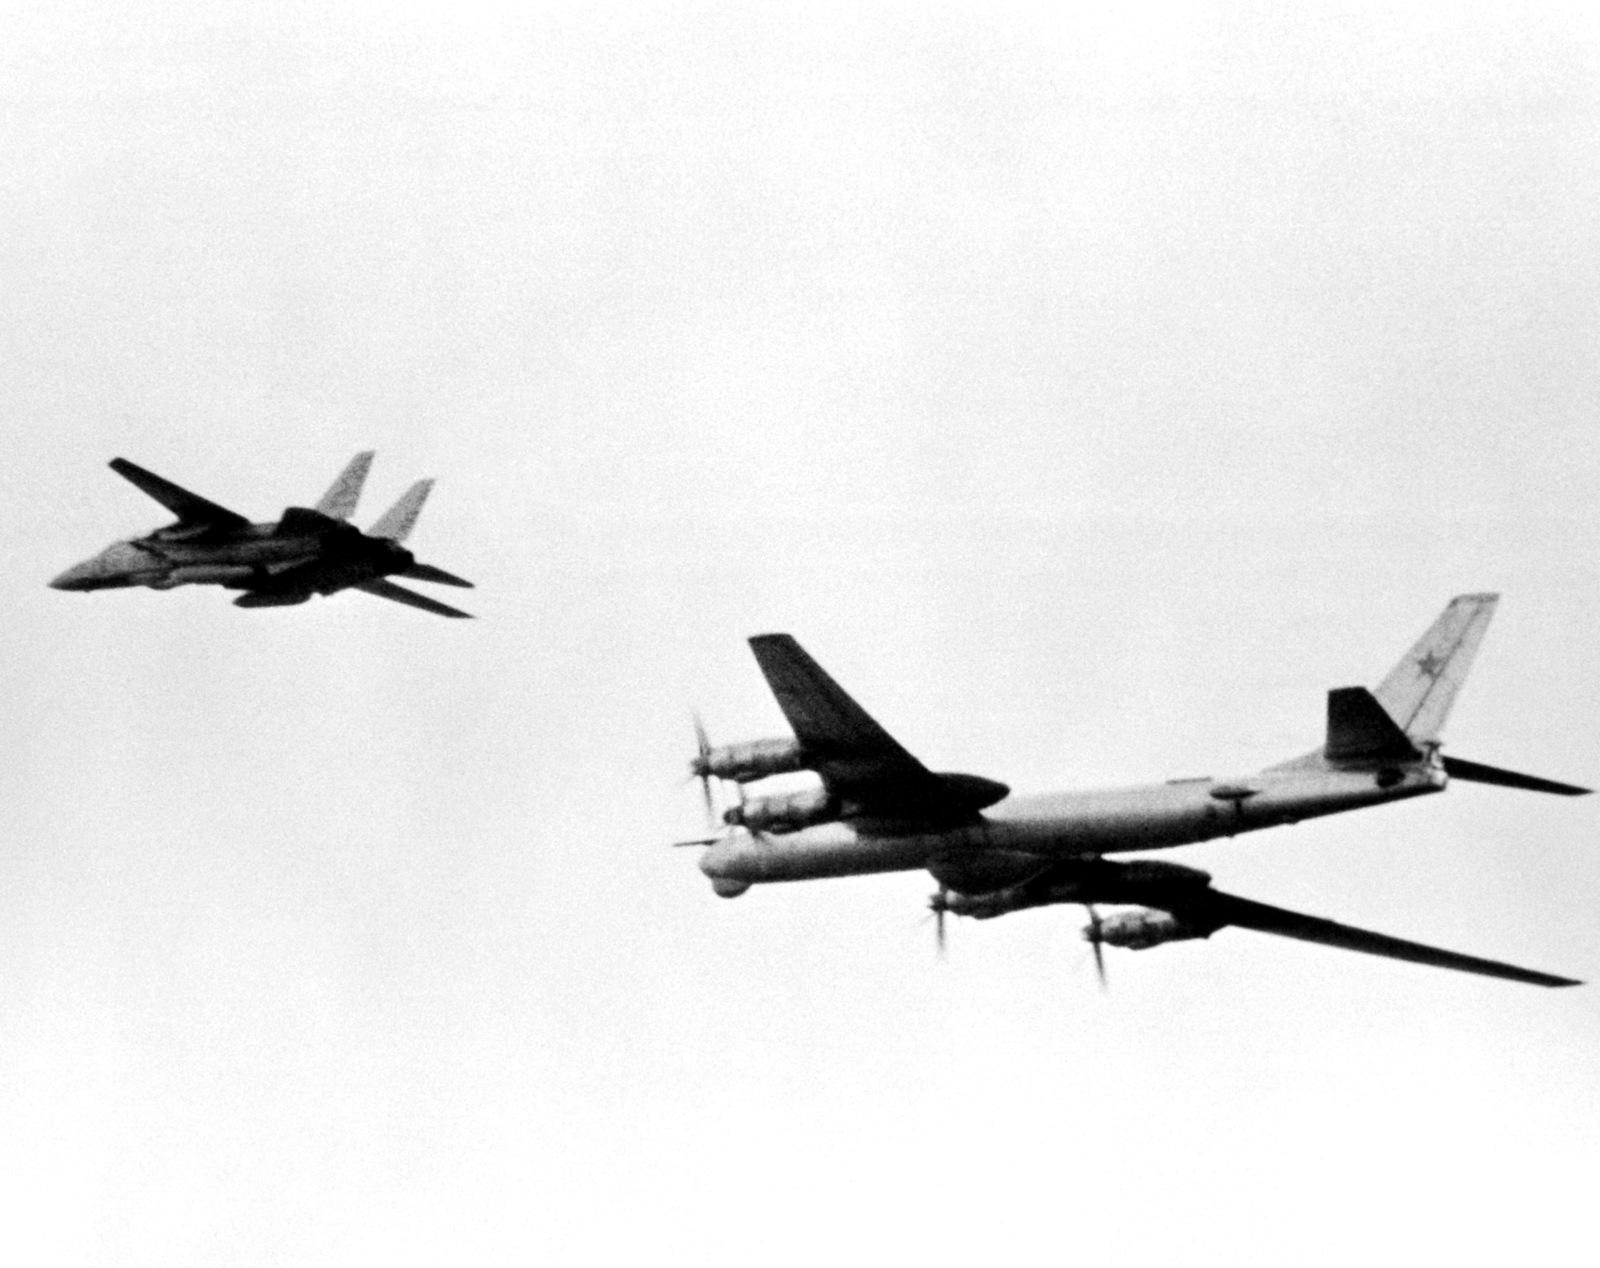 A left underside view of an F-14A Tomcat aircraft escorting a Soviet Tu-95 BEAR D reconnaissance aircraft away from the exercise Northern Wedding '82 task force. The Tomcat is from the aircraft carrier USS AMERICA (CV-66), not visible